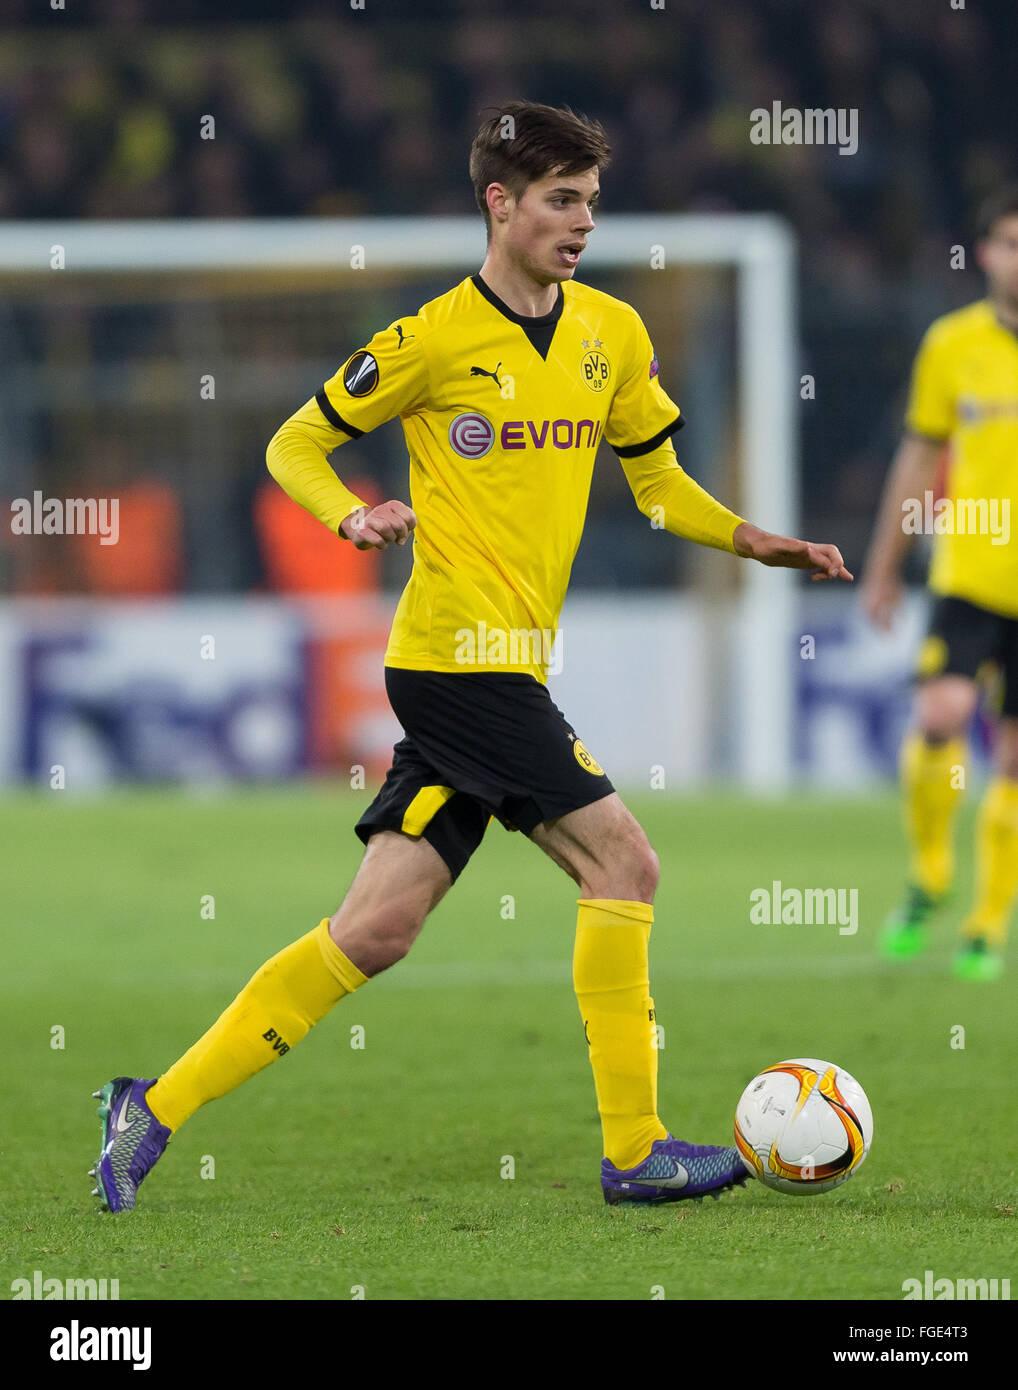 Dortmund Germany 18th Feb 2016 Dortmund s Julian Weigl in